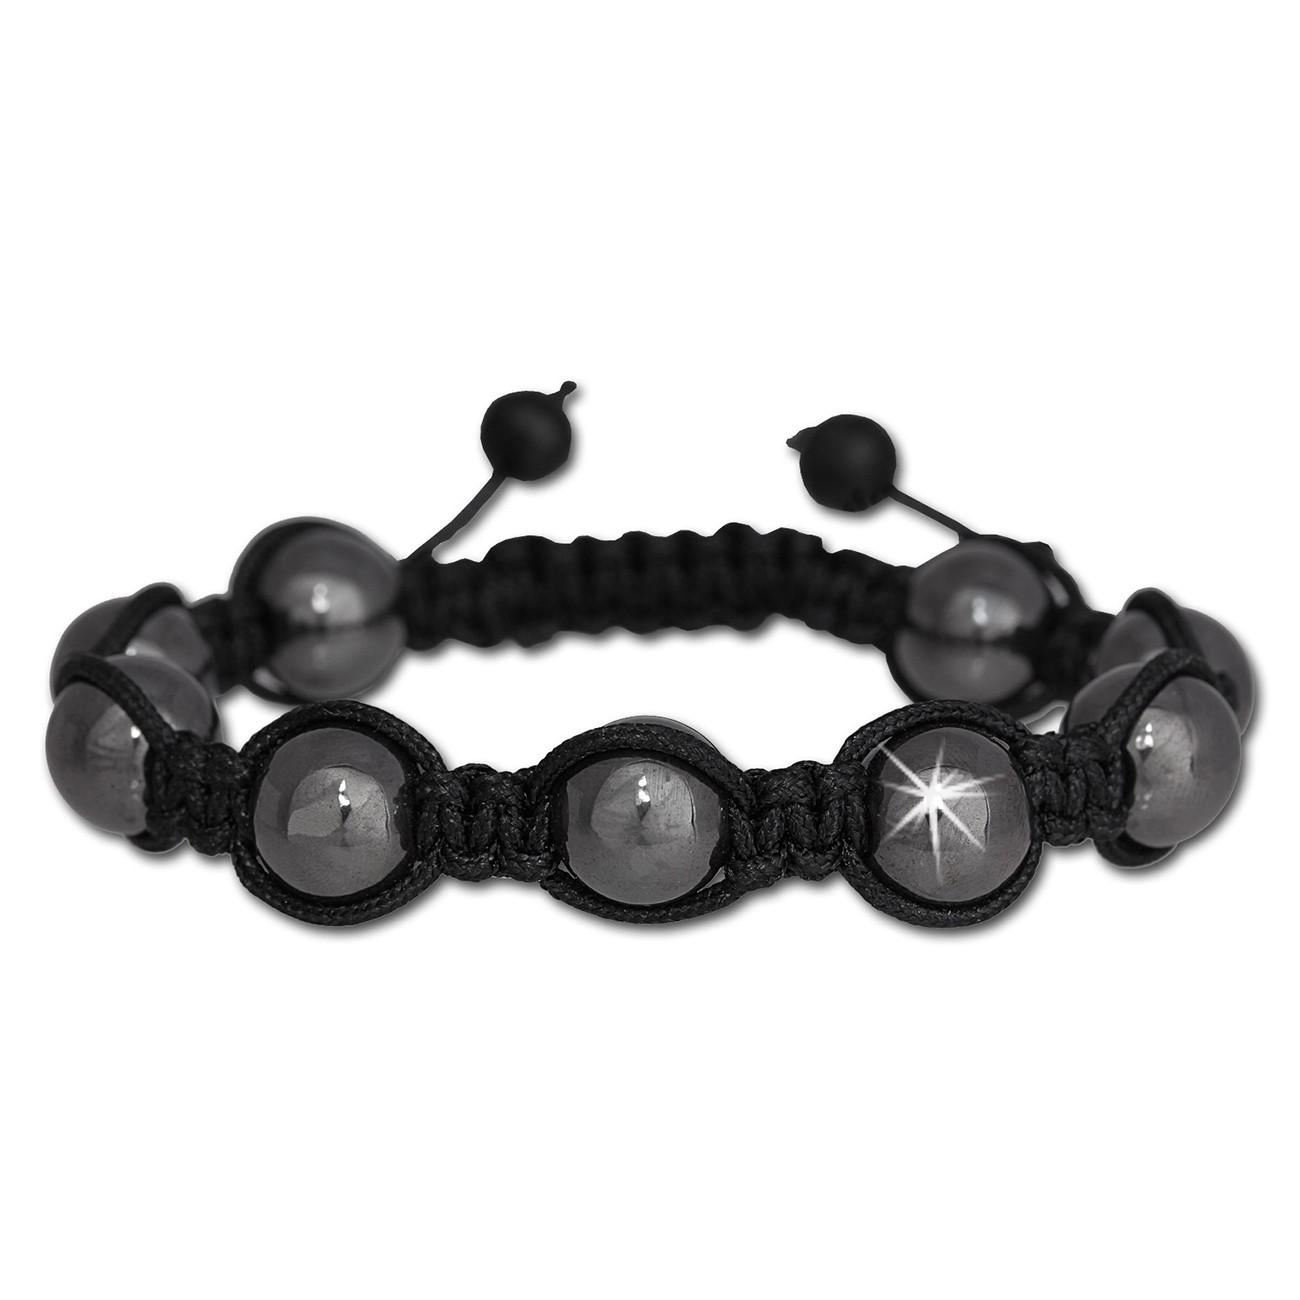 SilberDream Shamballa Armband Luxus schwarz aus Hämatit Kugeln SDY900